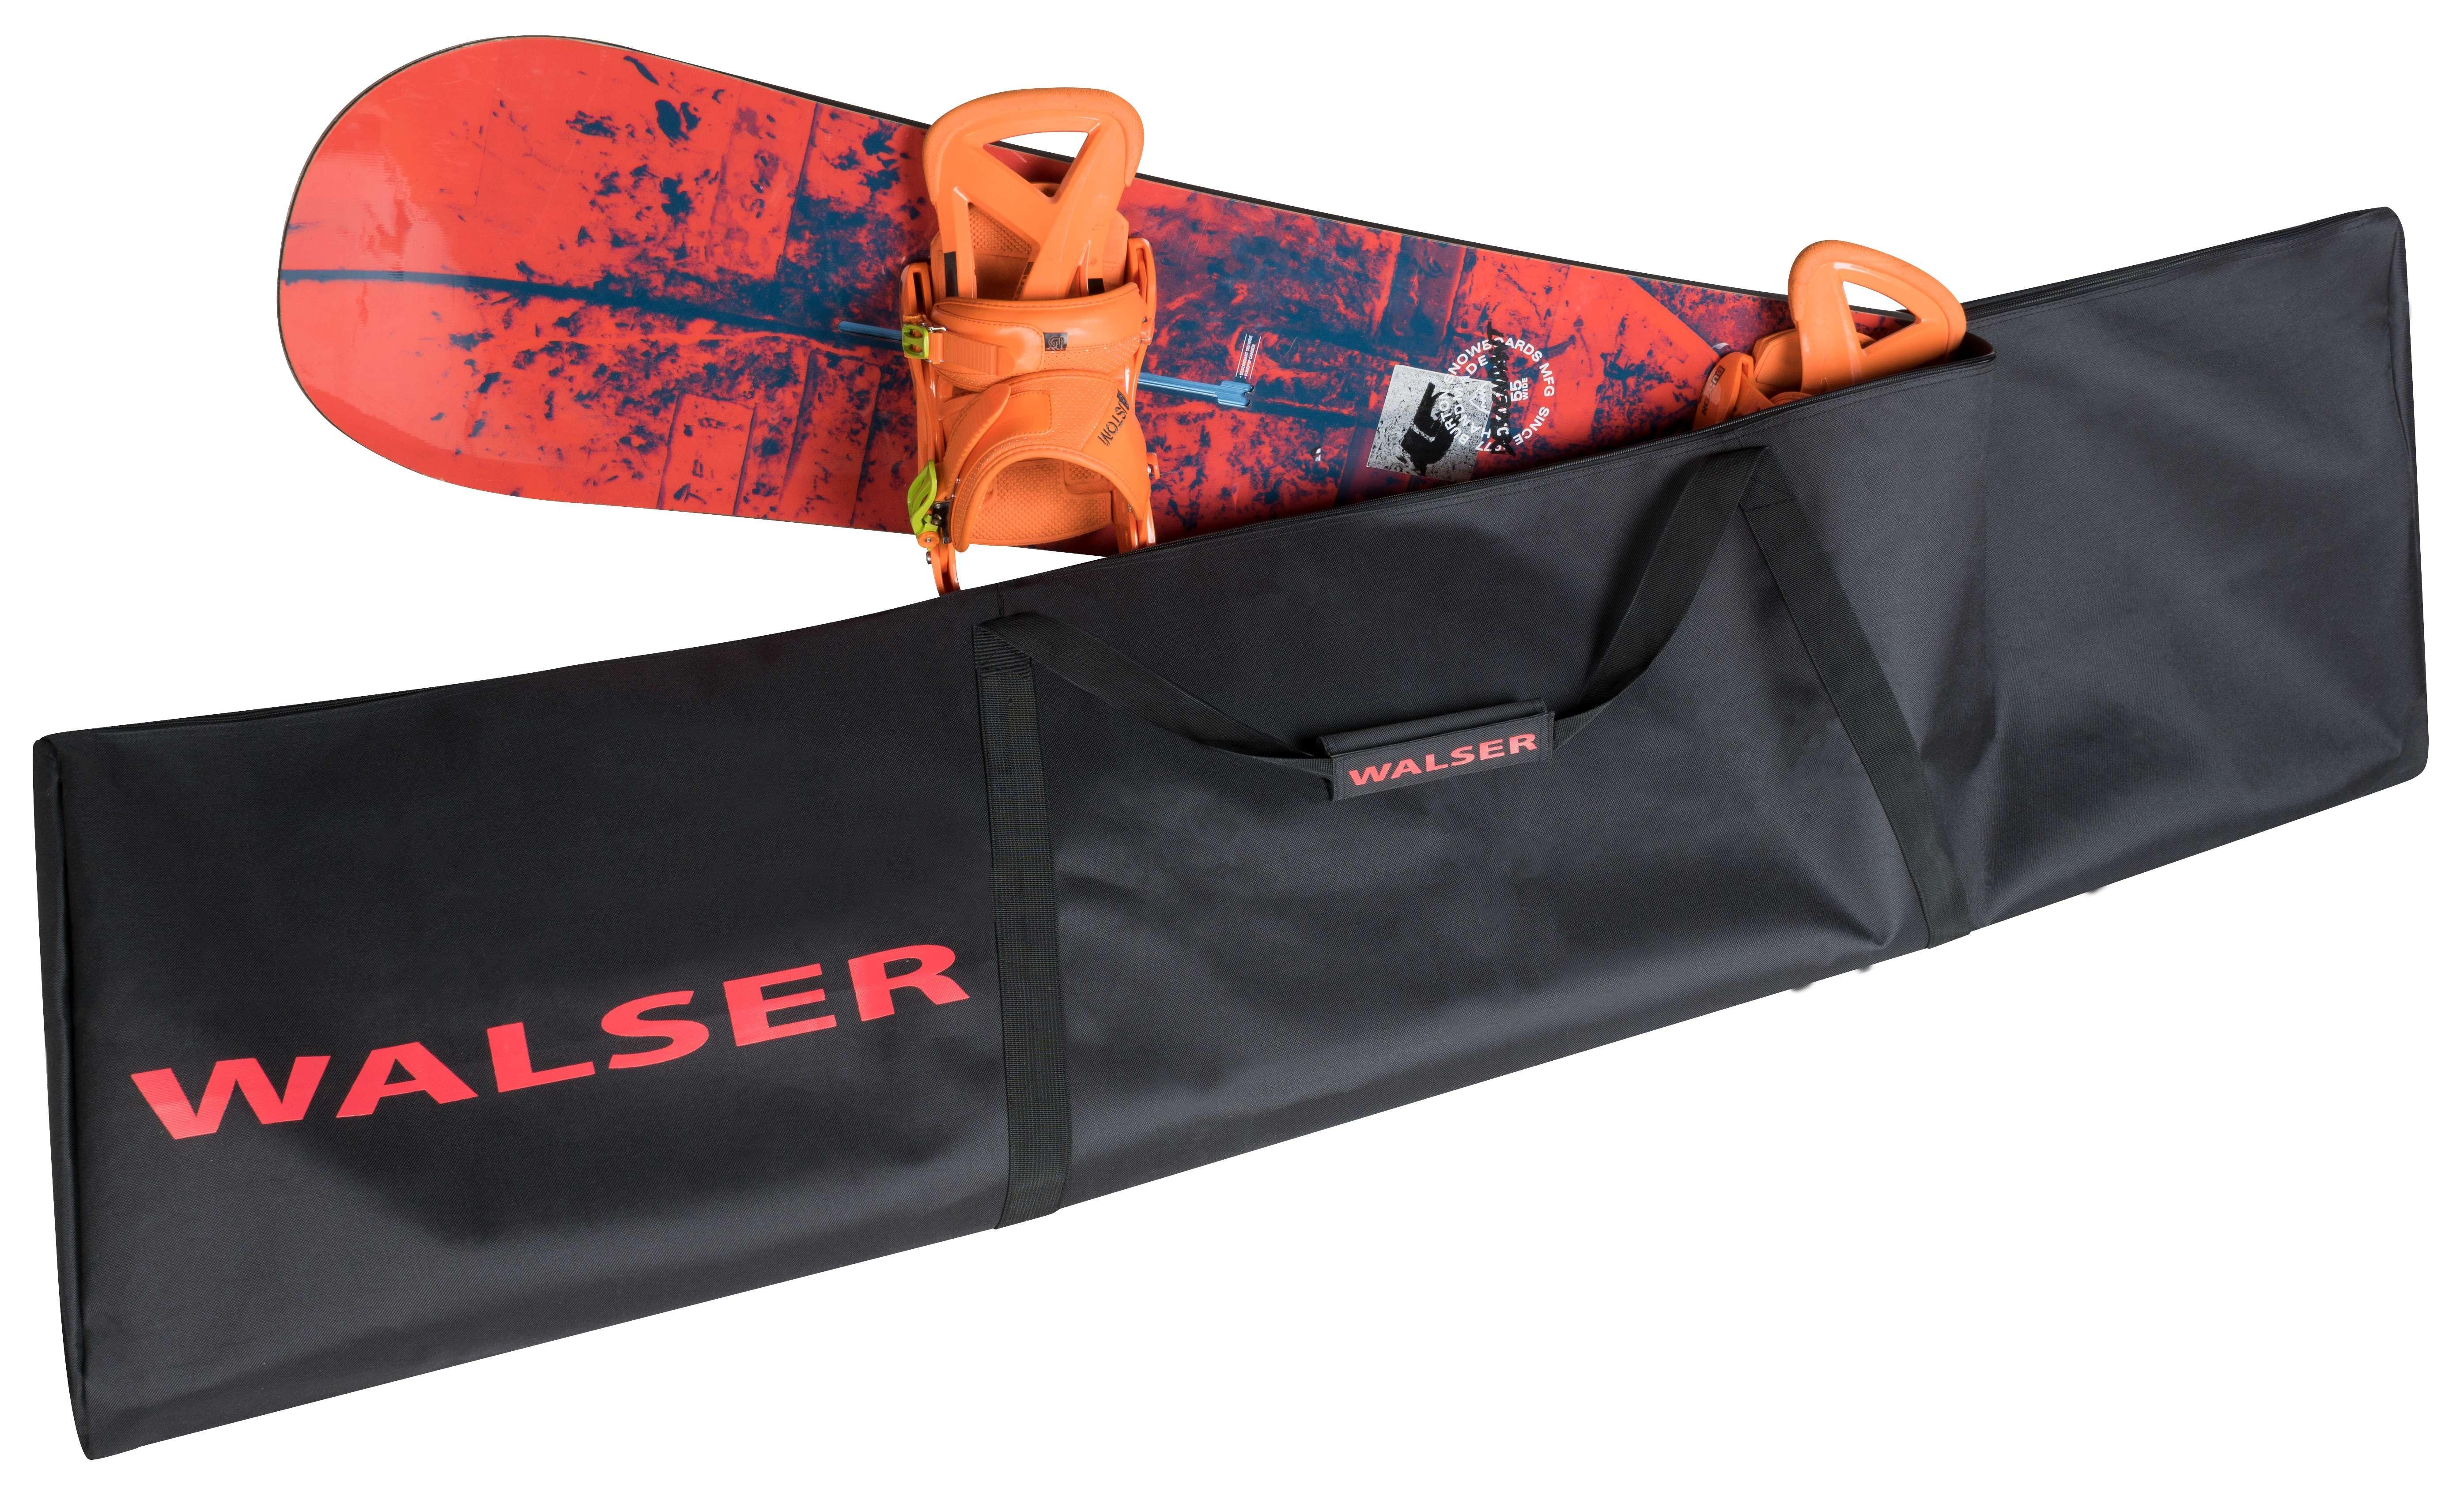 Ski bag WALSER 30553 expert knowledge